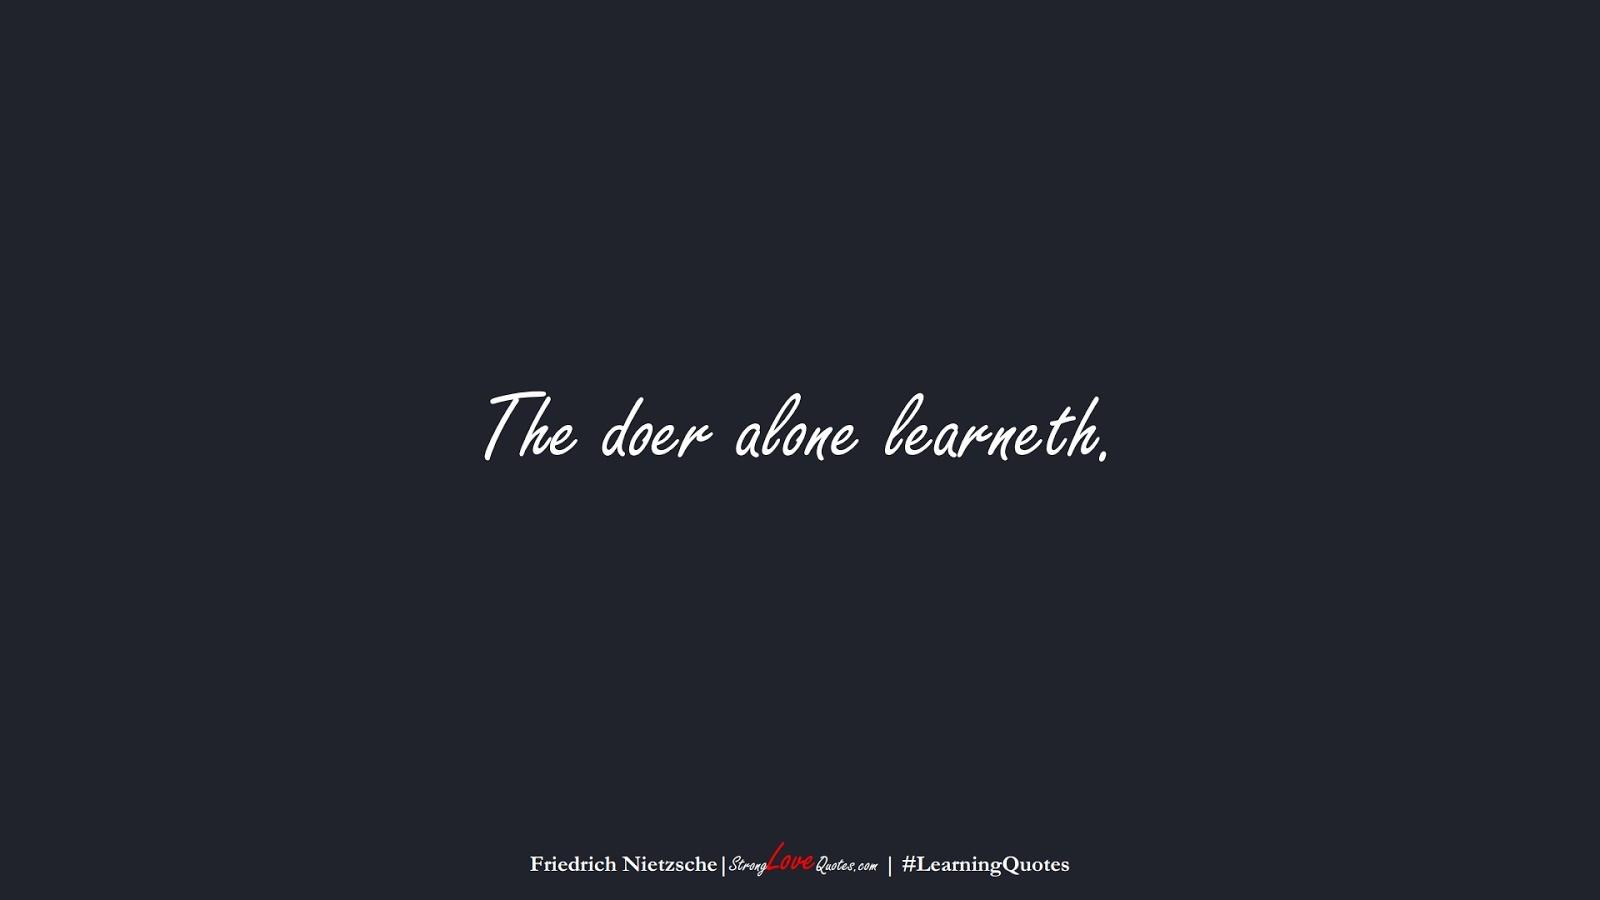 The doer alone learneth. (Friedrich Nietzsche);  #LearningQuotes